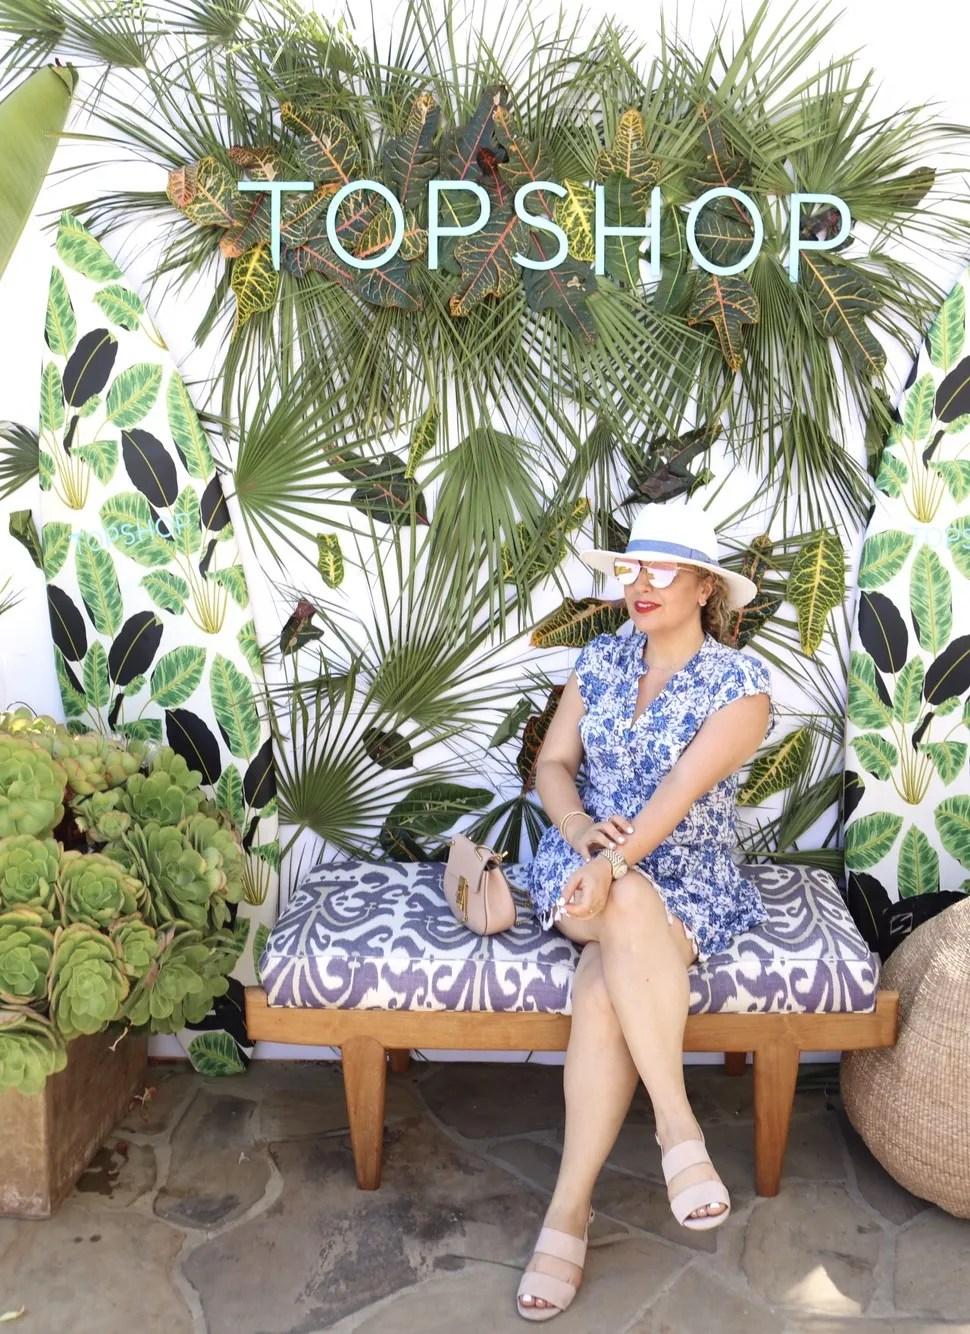 Liz in Los Angeles at Malibu Beach House